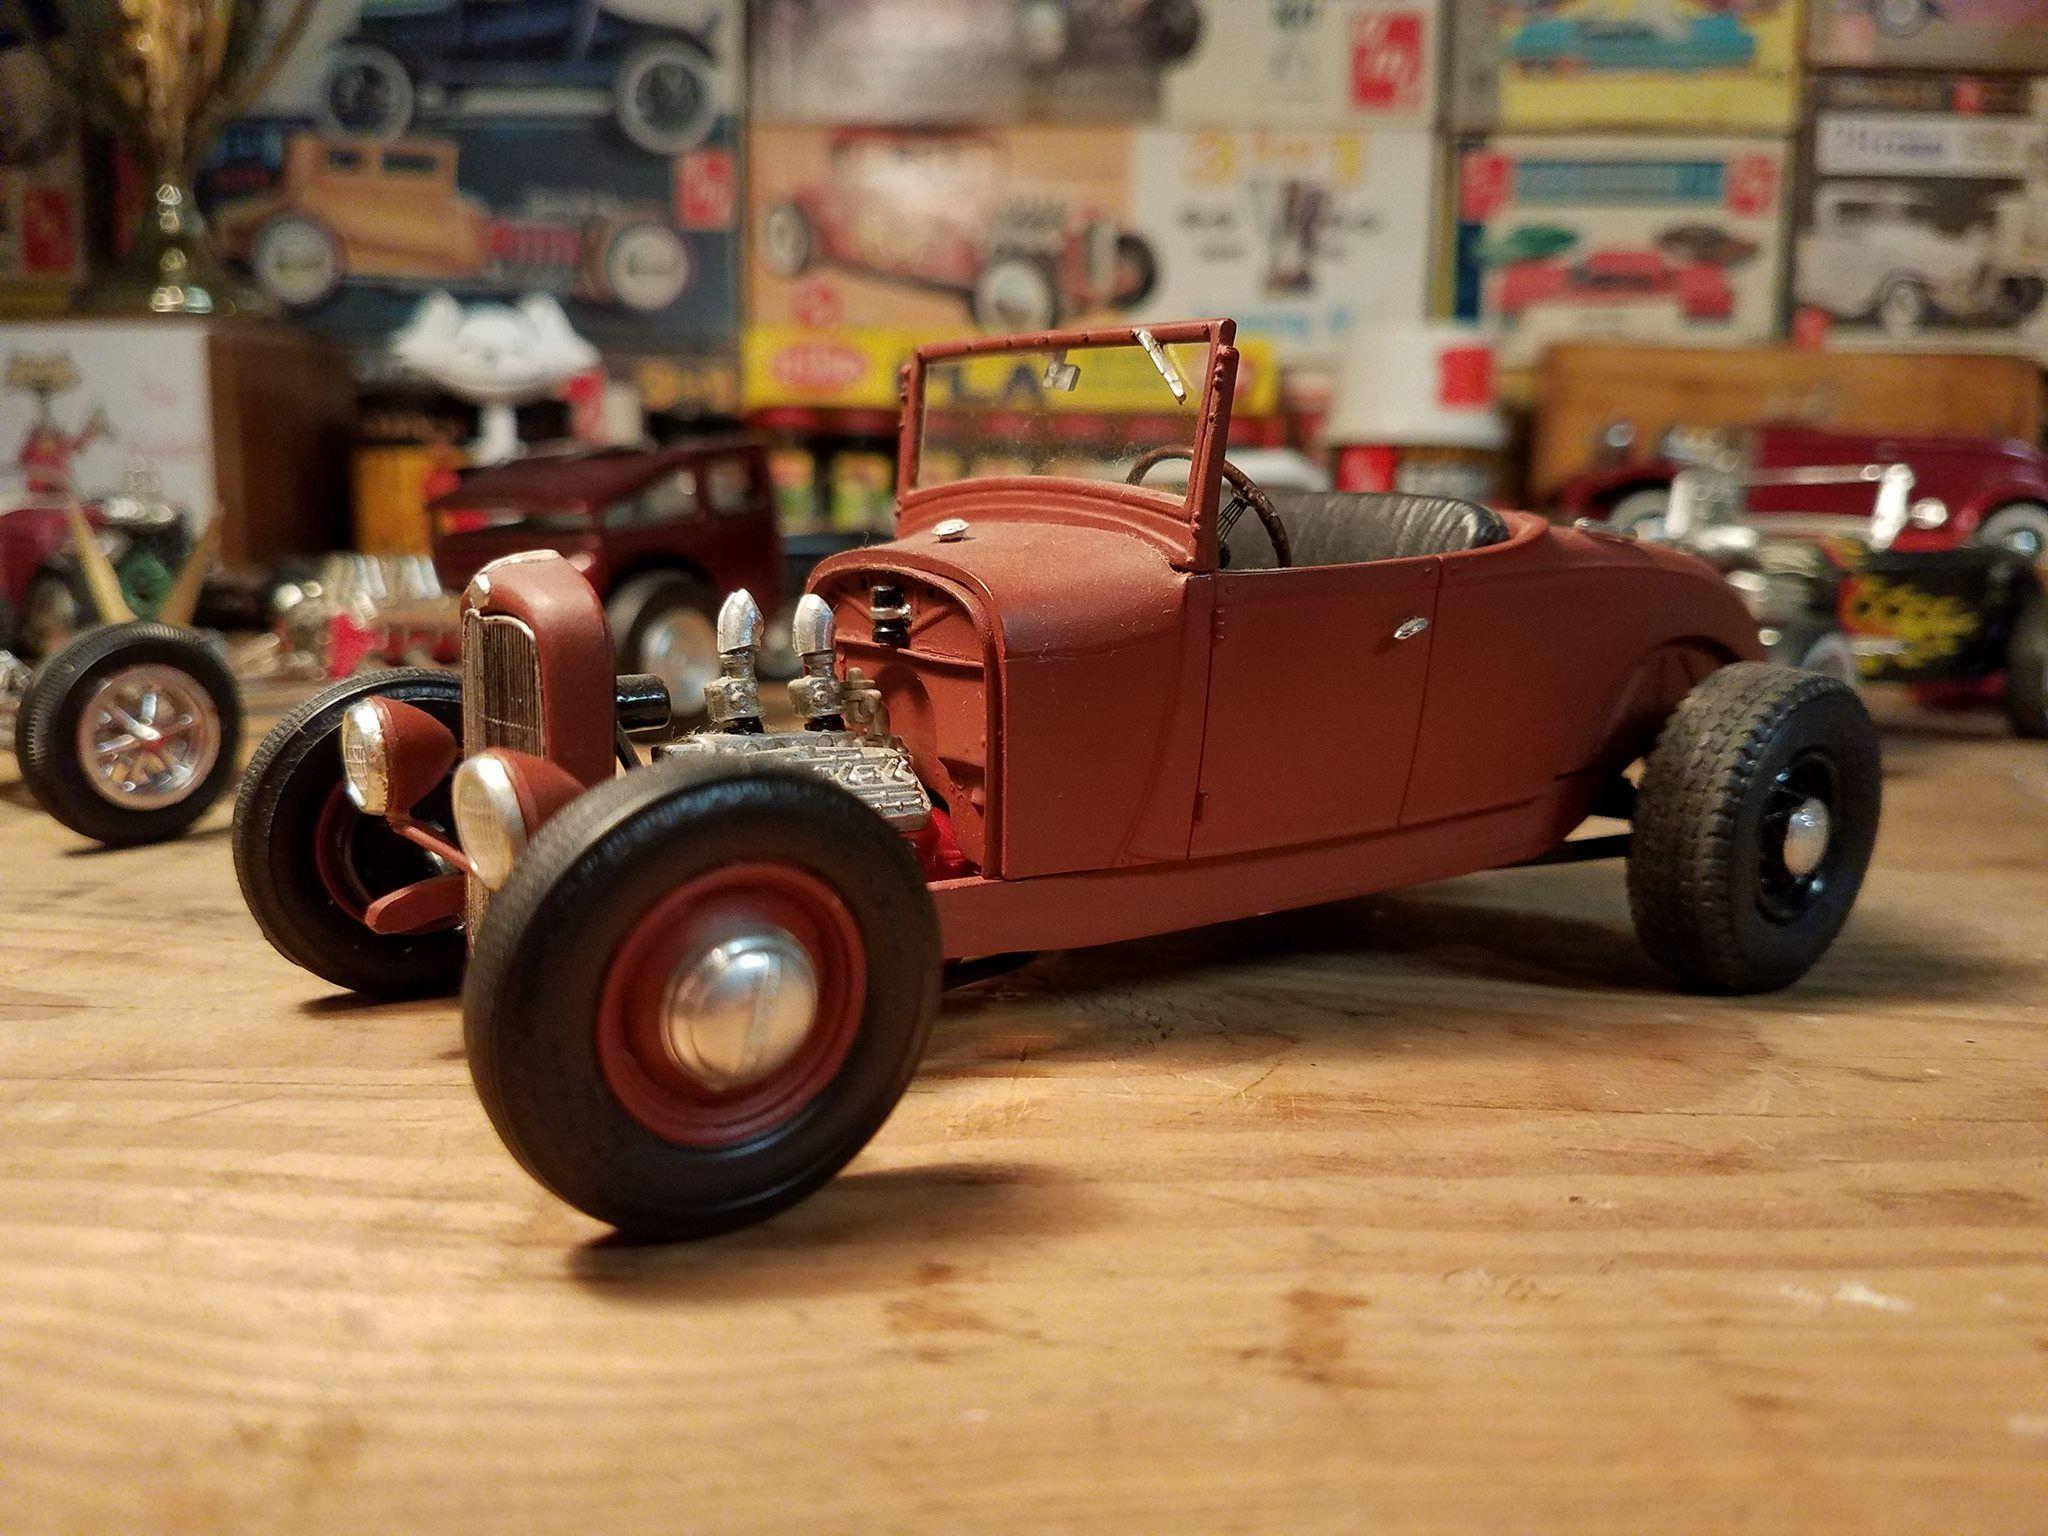 32 Ford Hot Rod | Scale Model Cars & Trucks | Pinterest | Model car ...